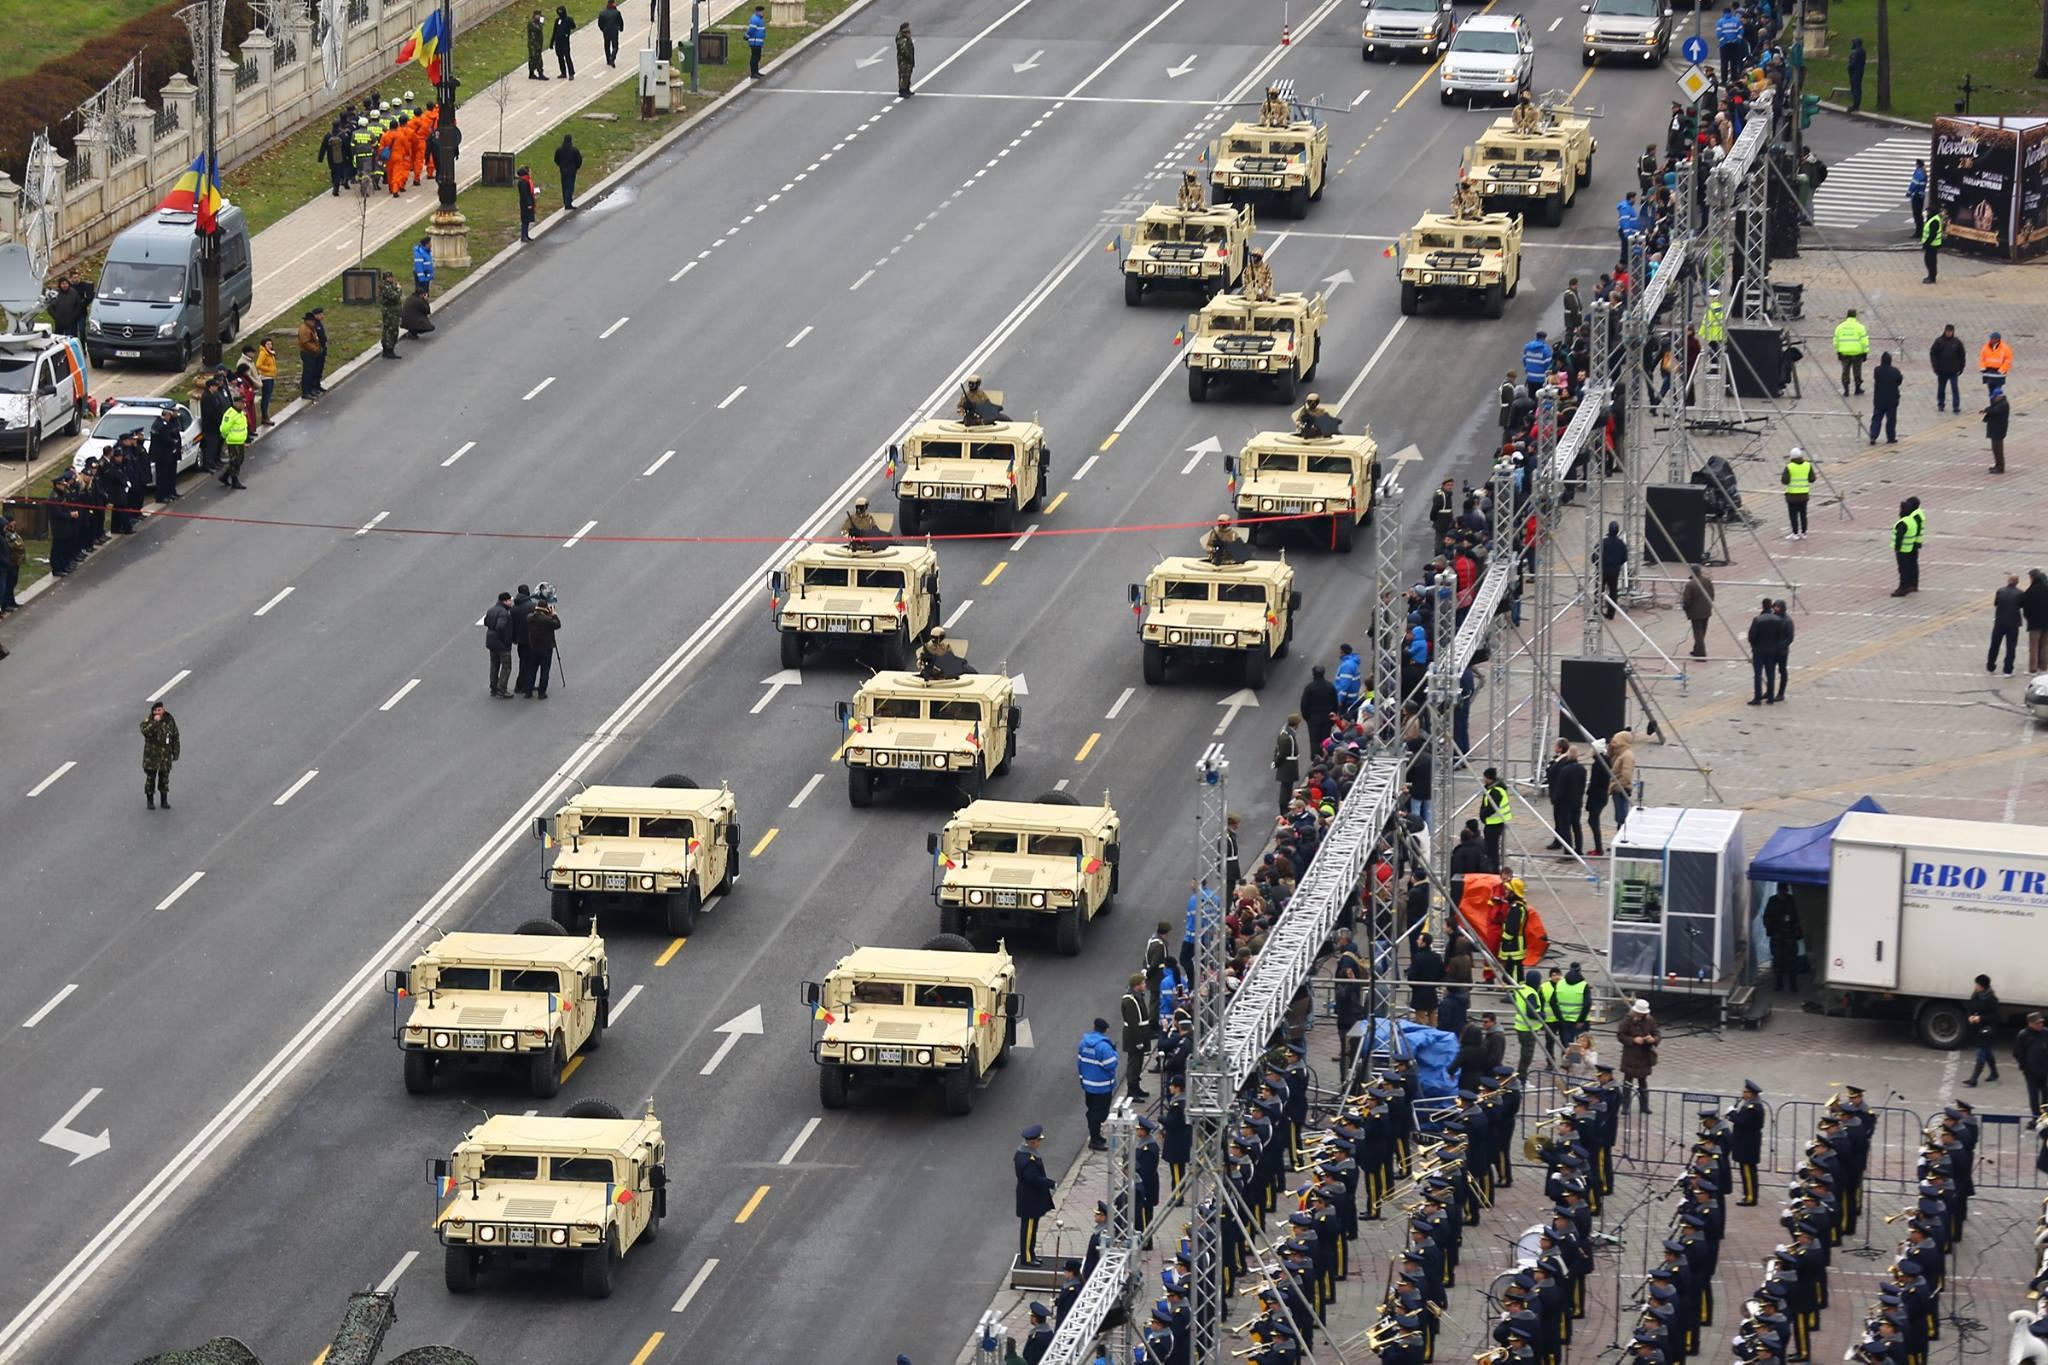 Repetitii parada militara 1 decembrie. Foto - MApN 4